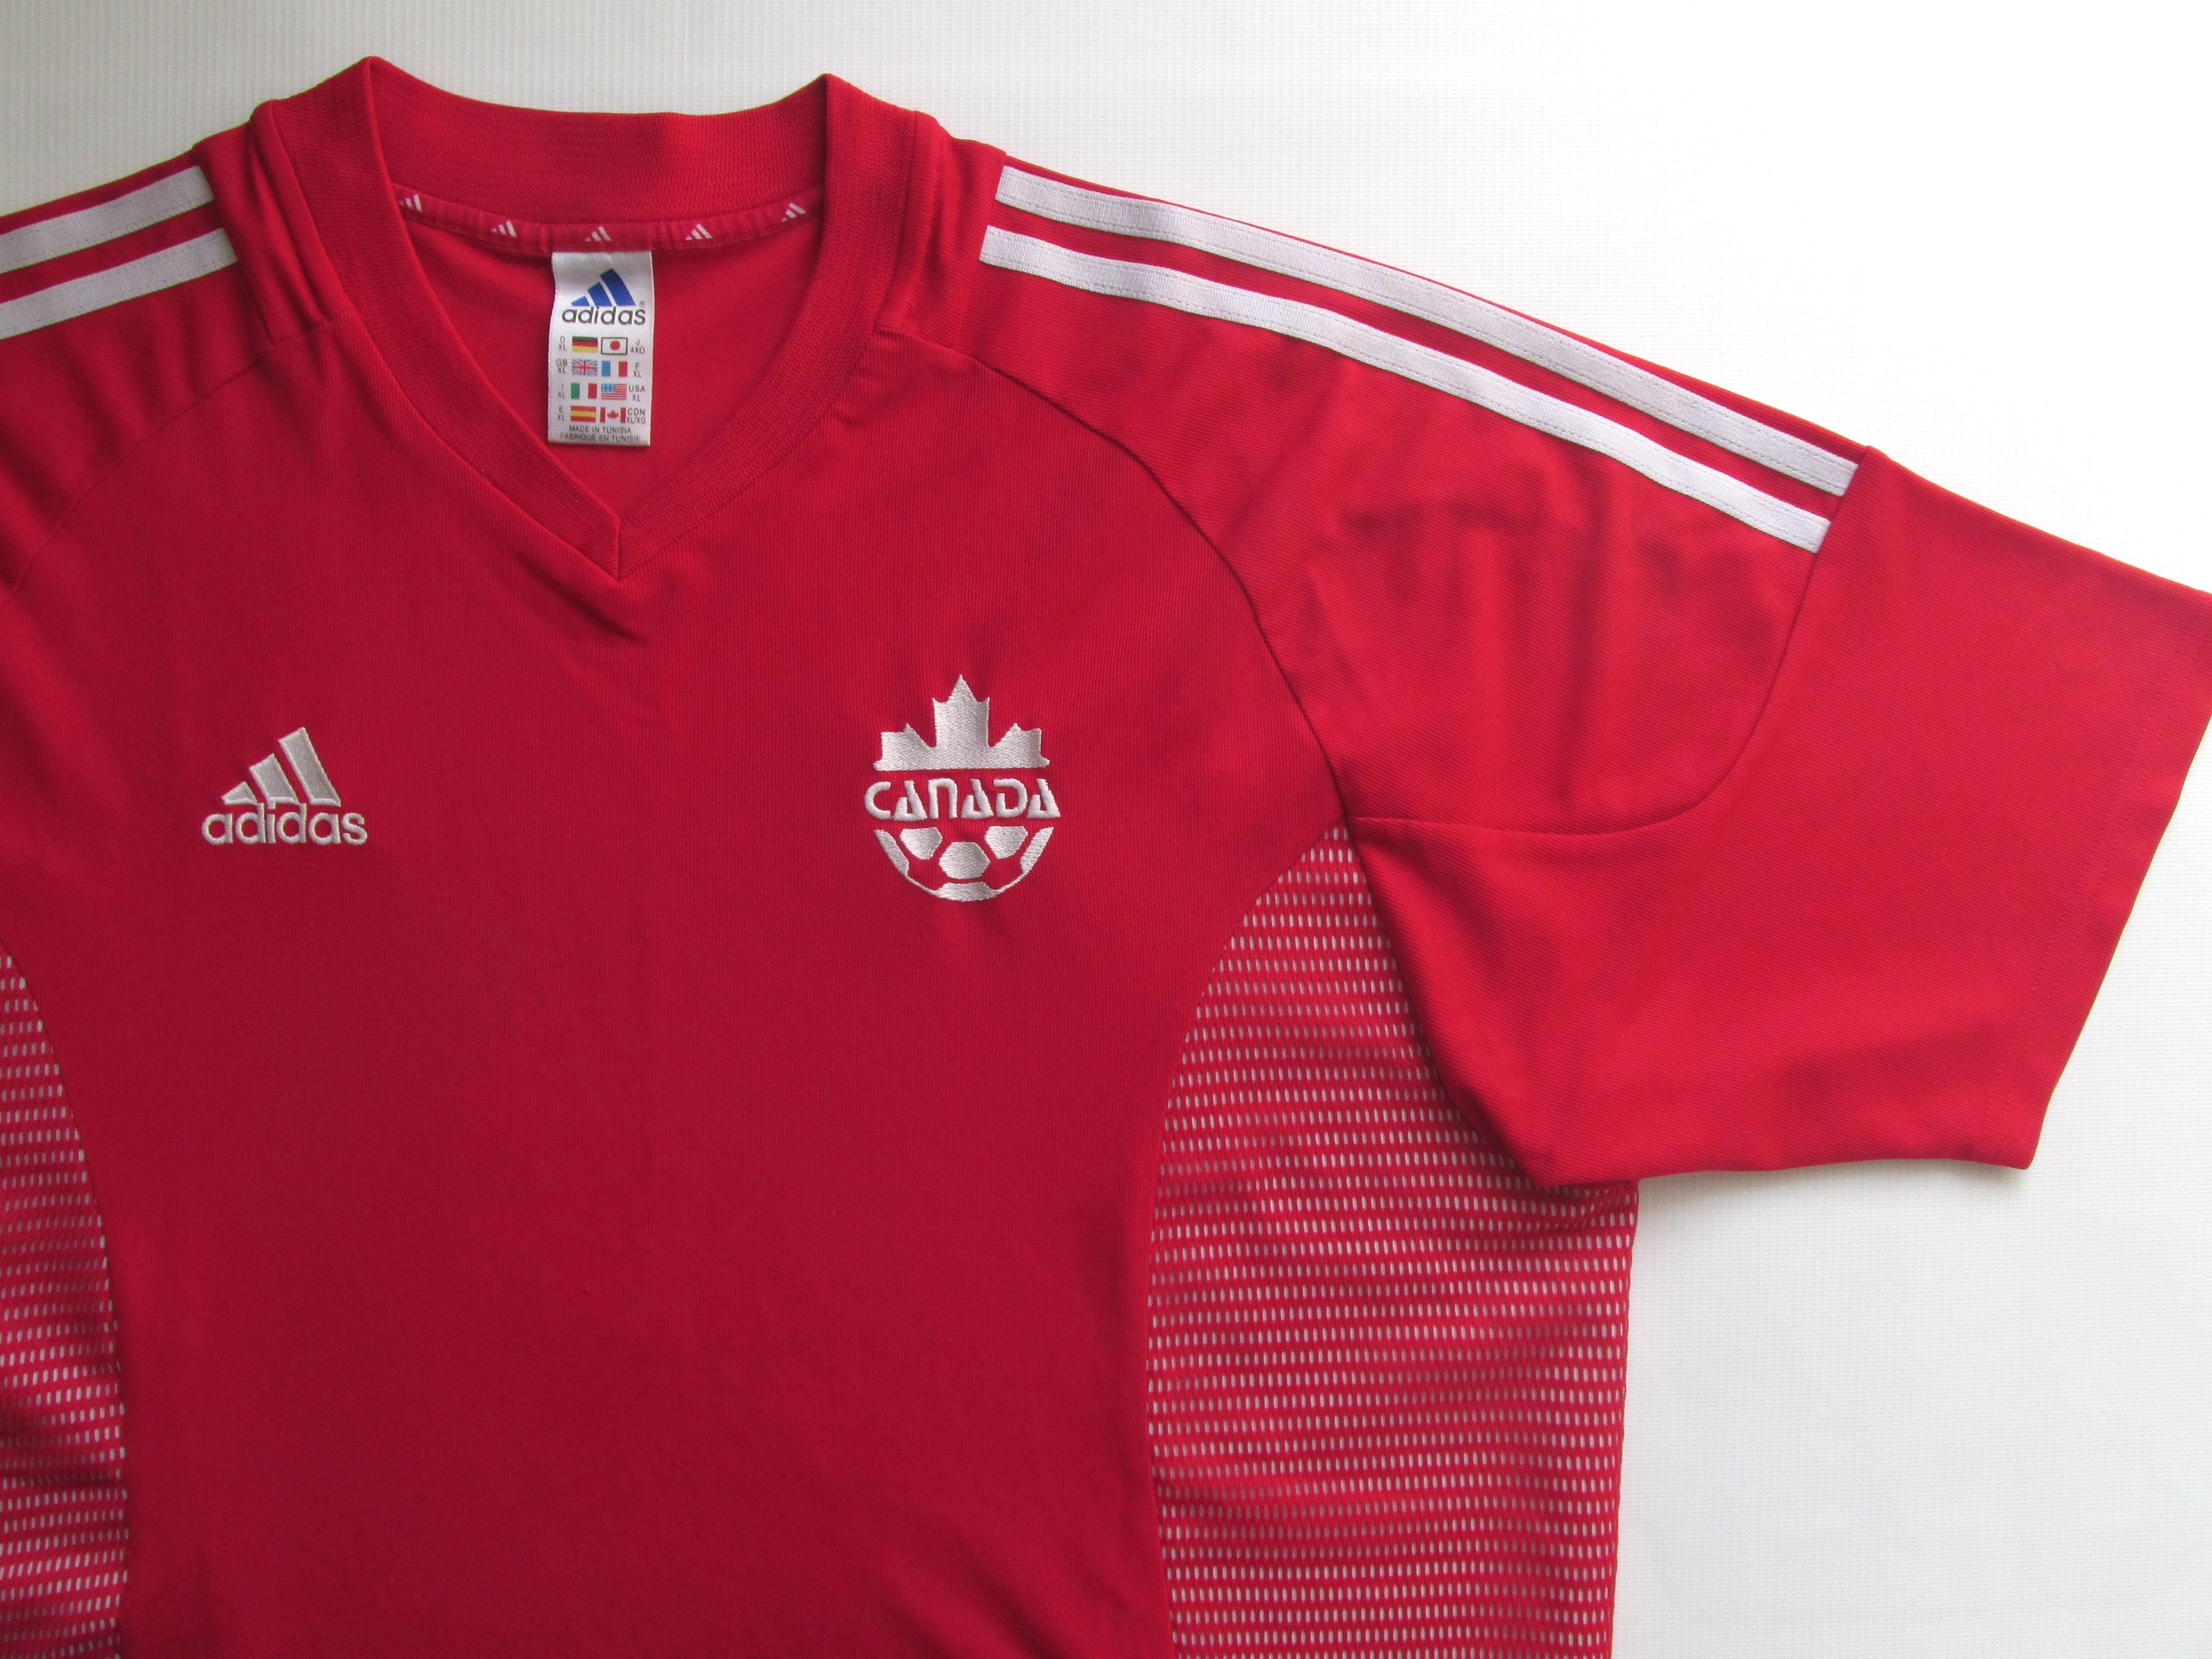 Canada 2002 2003 2004 Home Football Shirt Soccer Jersey Maillot Maglia Adidas Xl Football Shirts Soccer Jersey National Football Teams